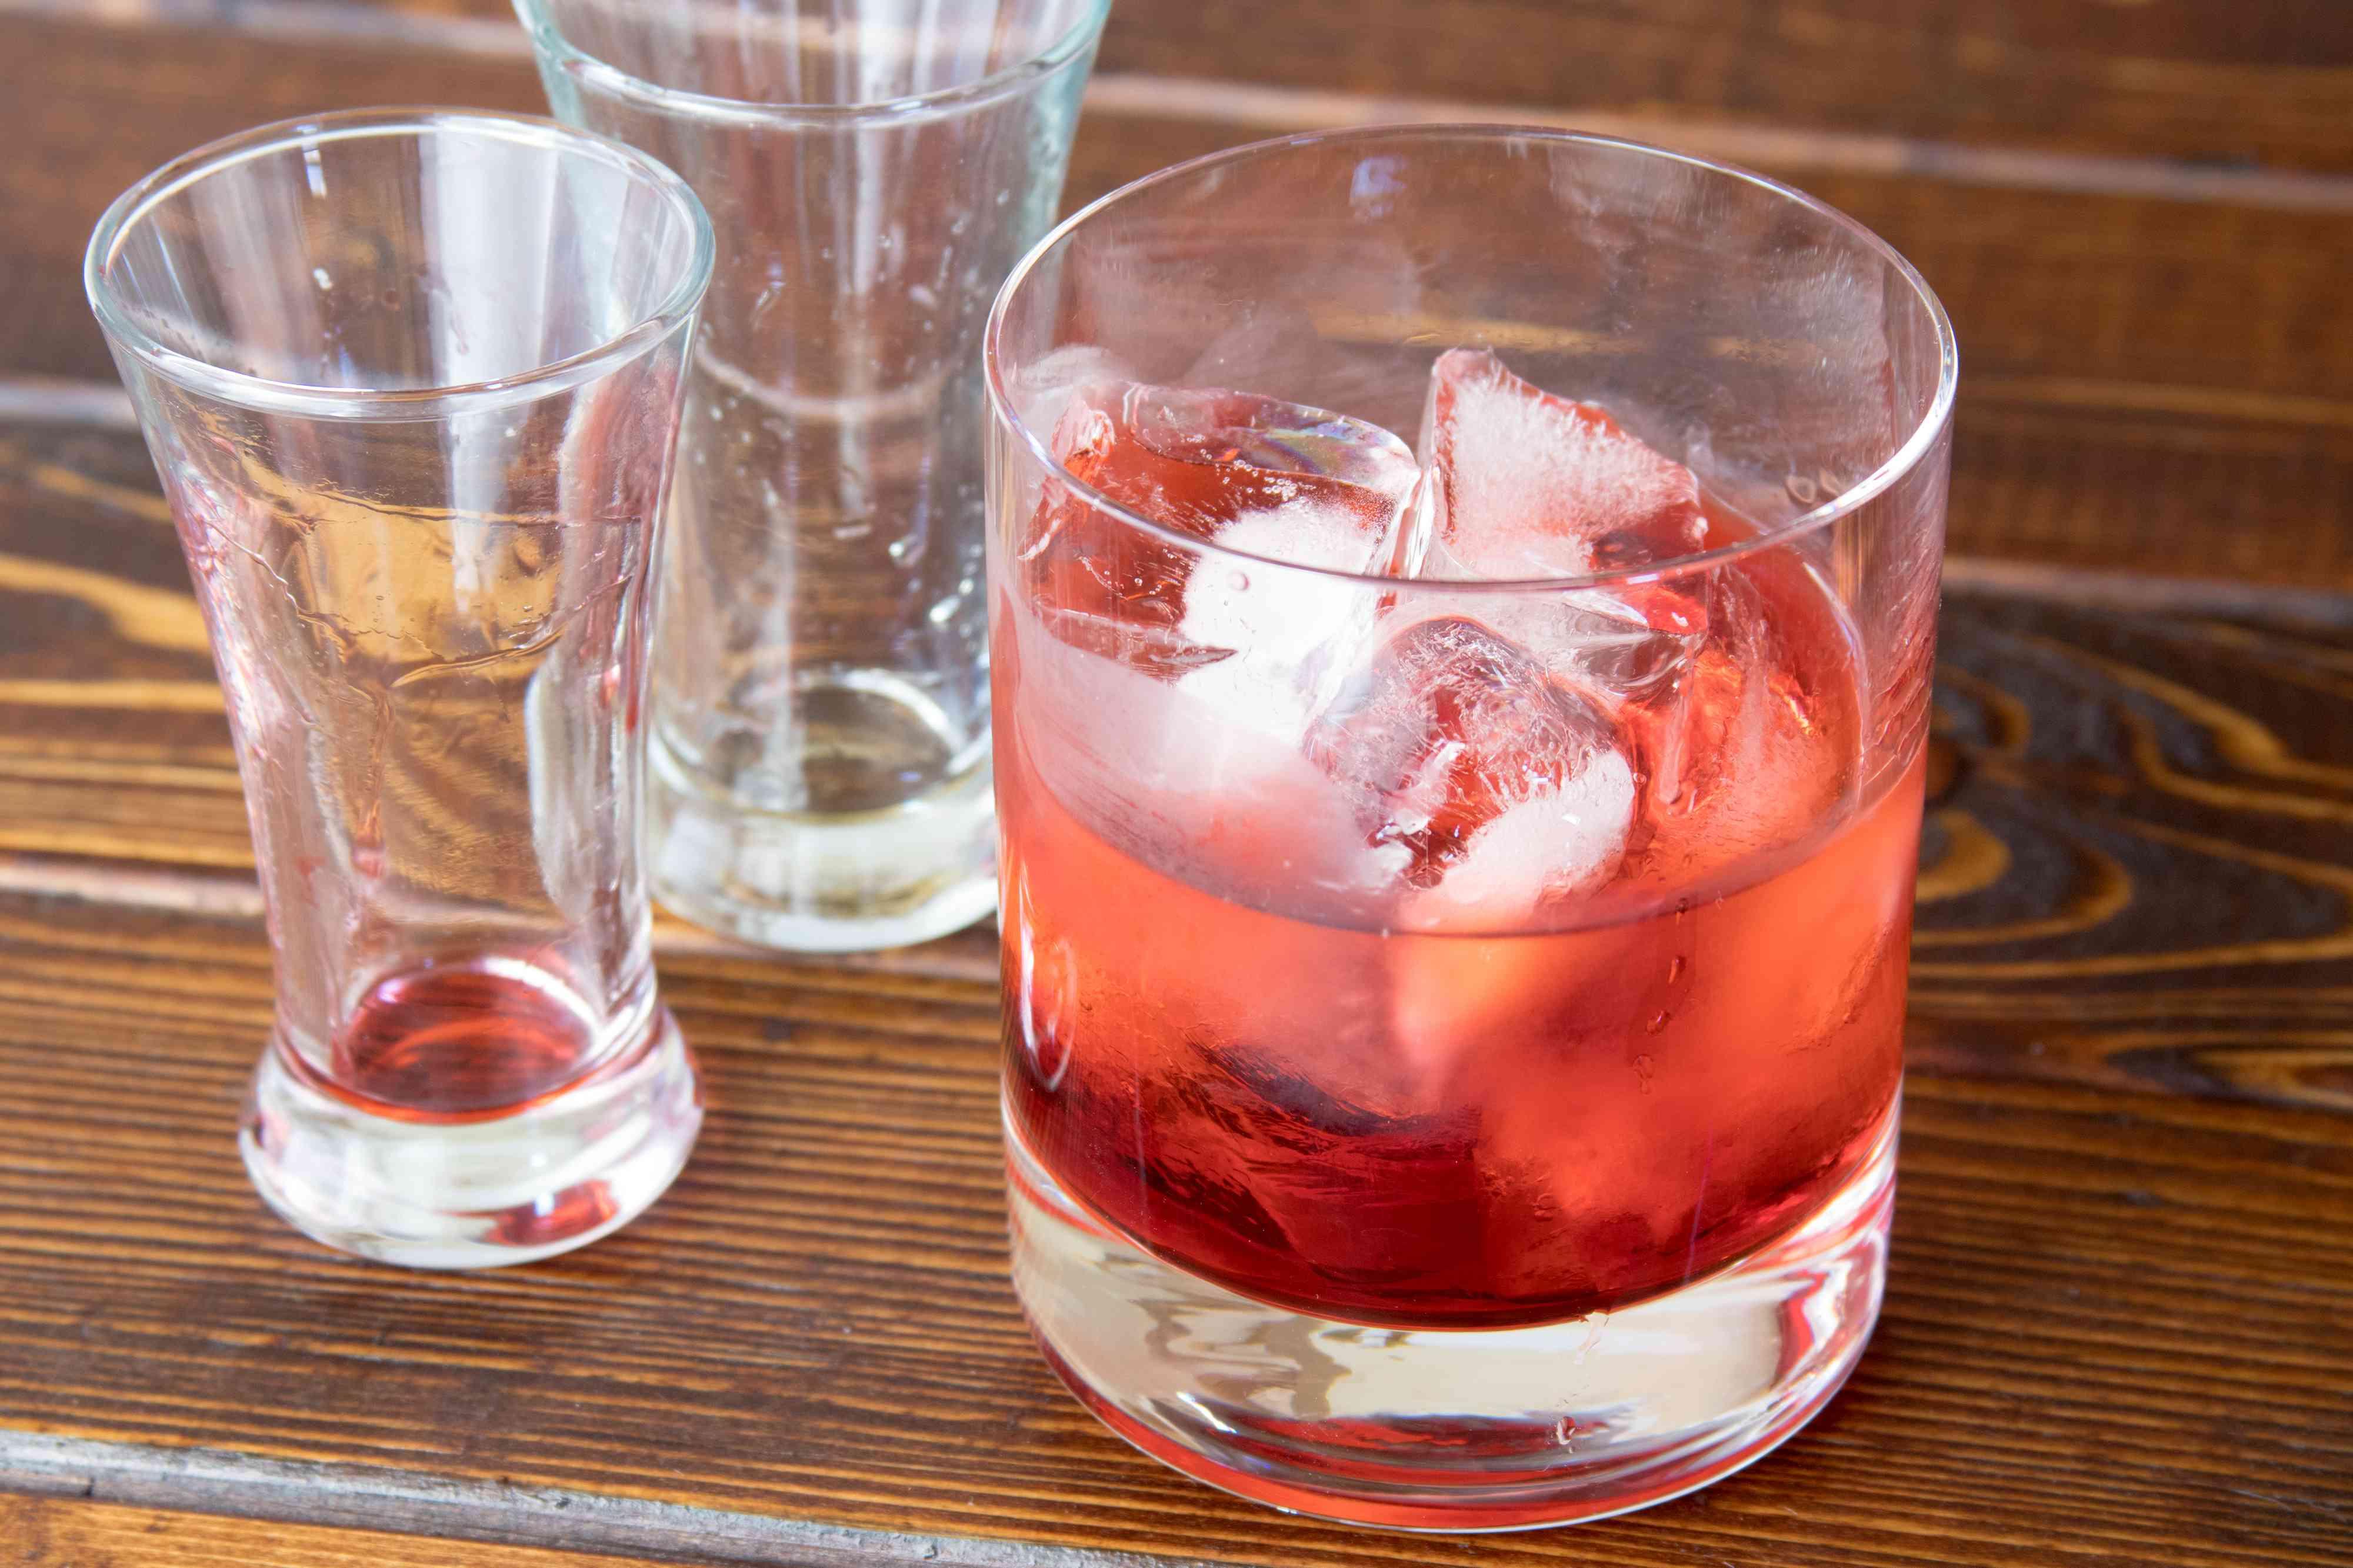 Pouring the hazelnut and raspberry liqueurs